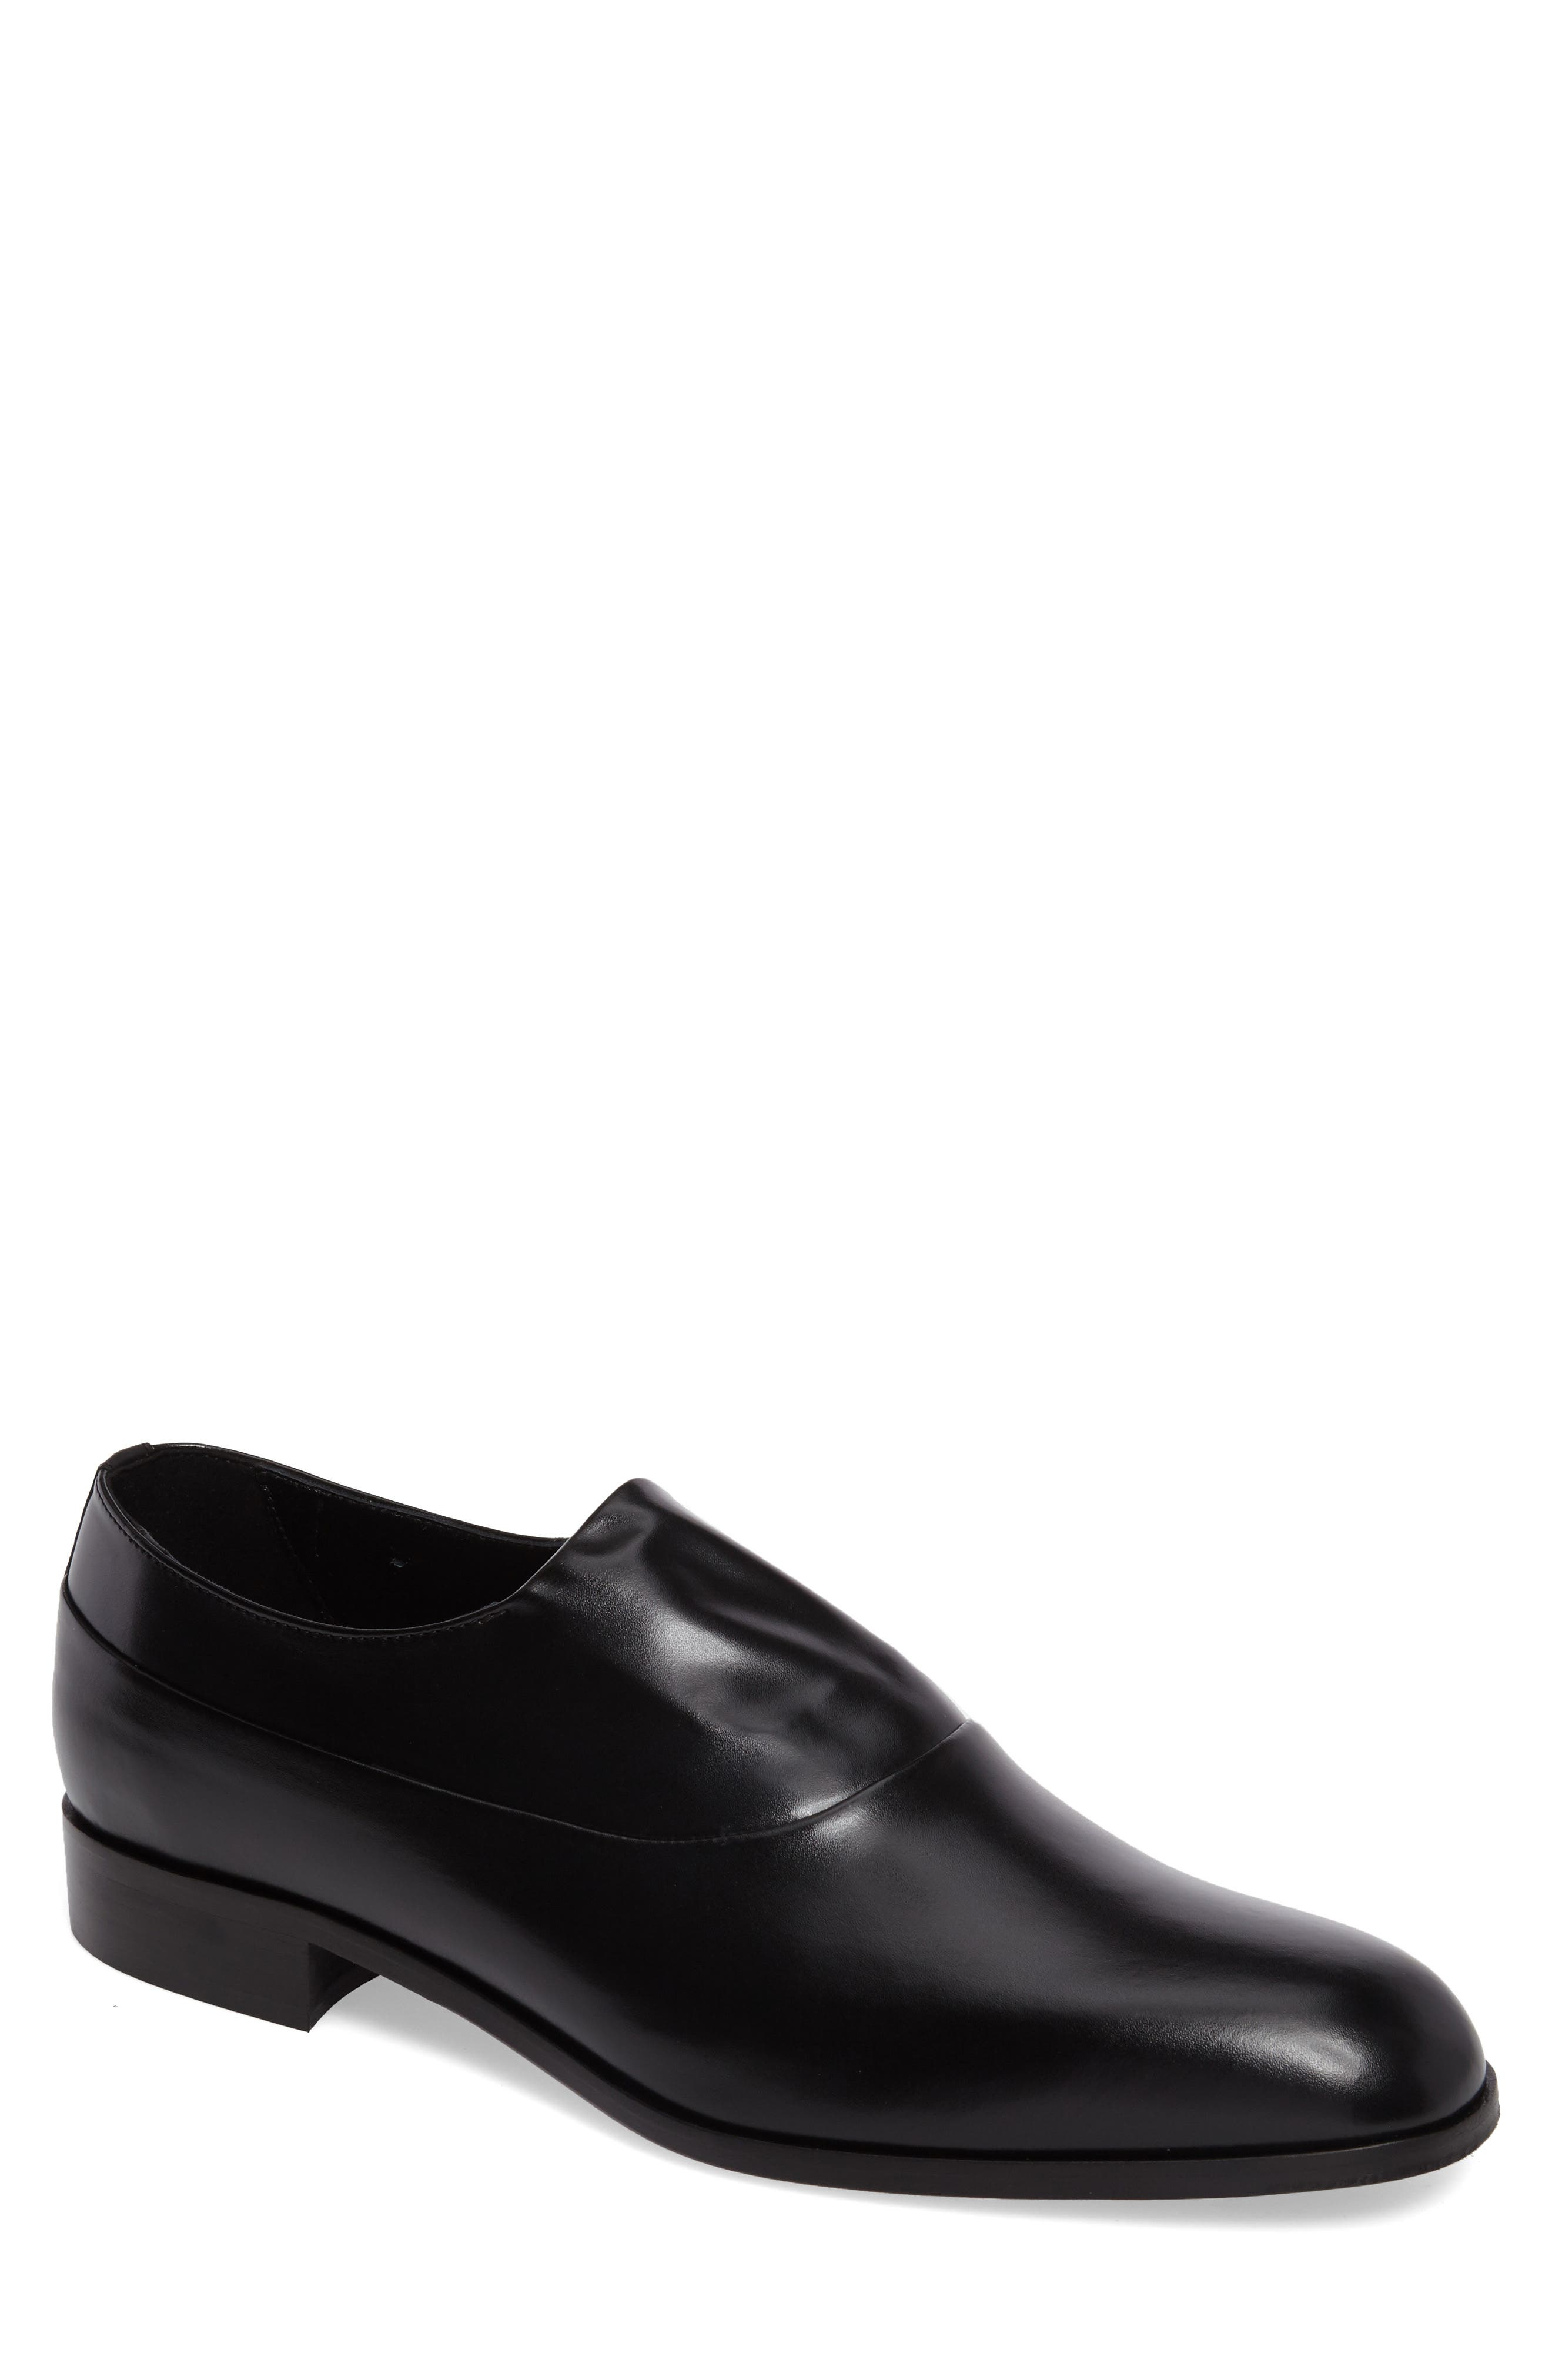 Marcio Venetian Loafer,                             Main thumbnail 1, color,                             Black